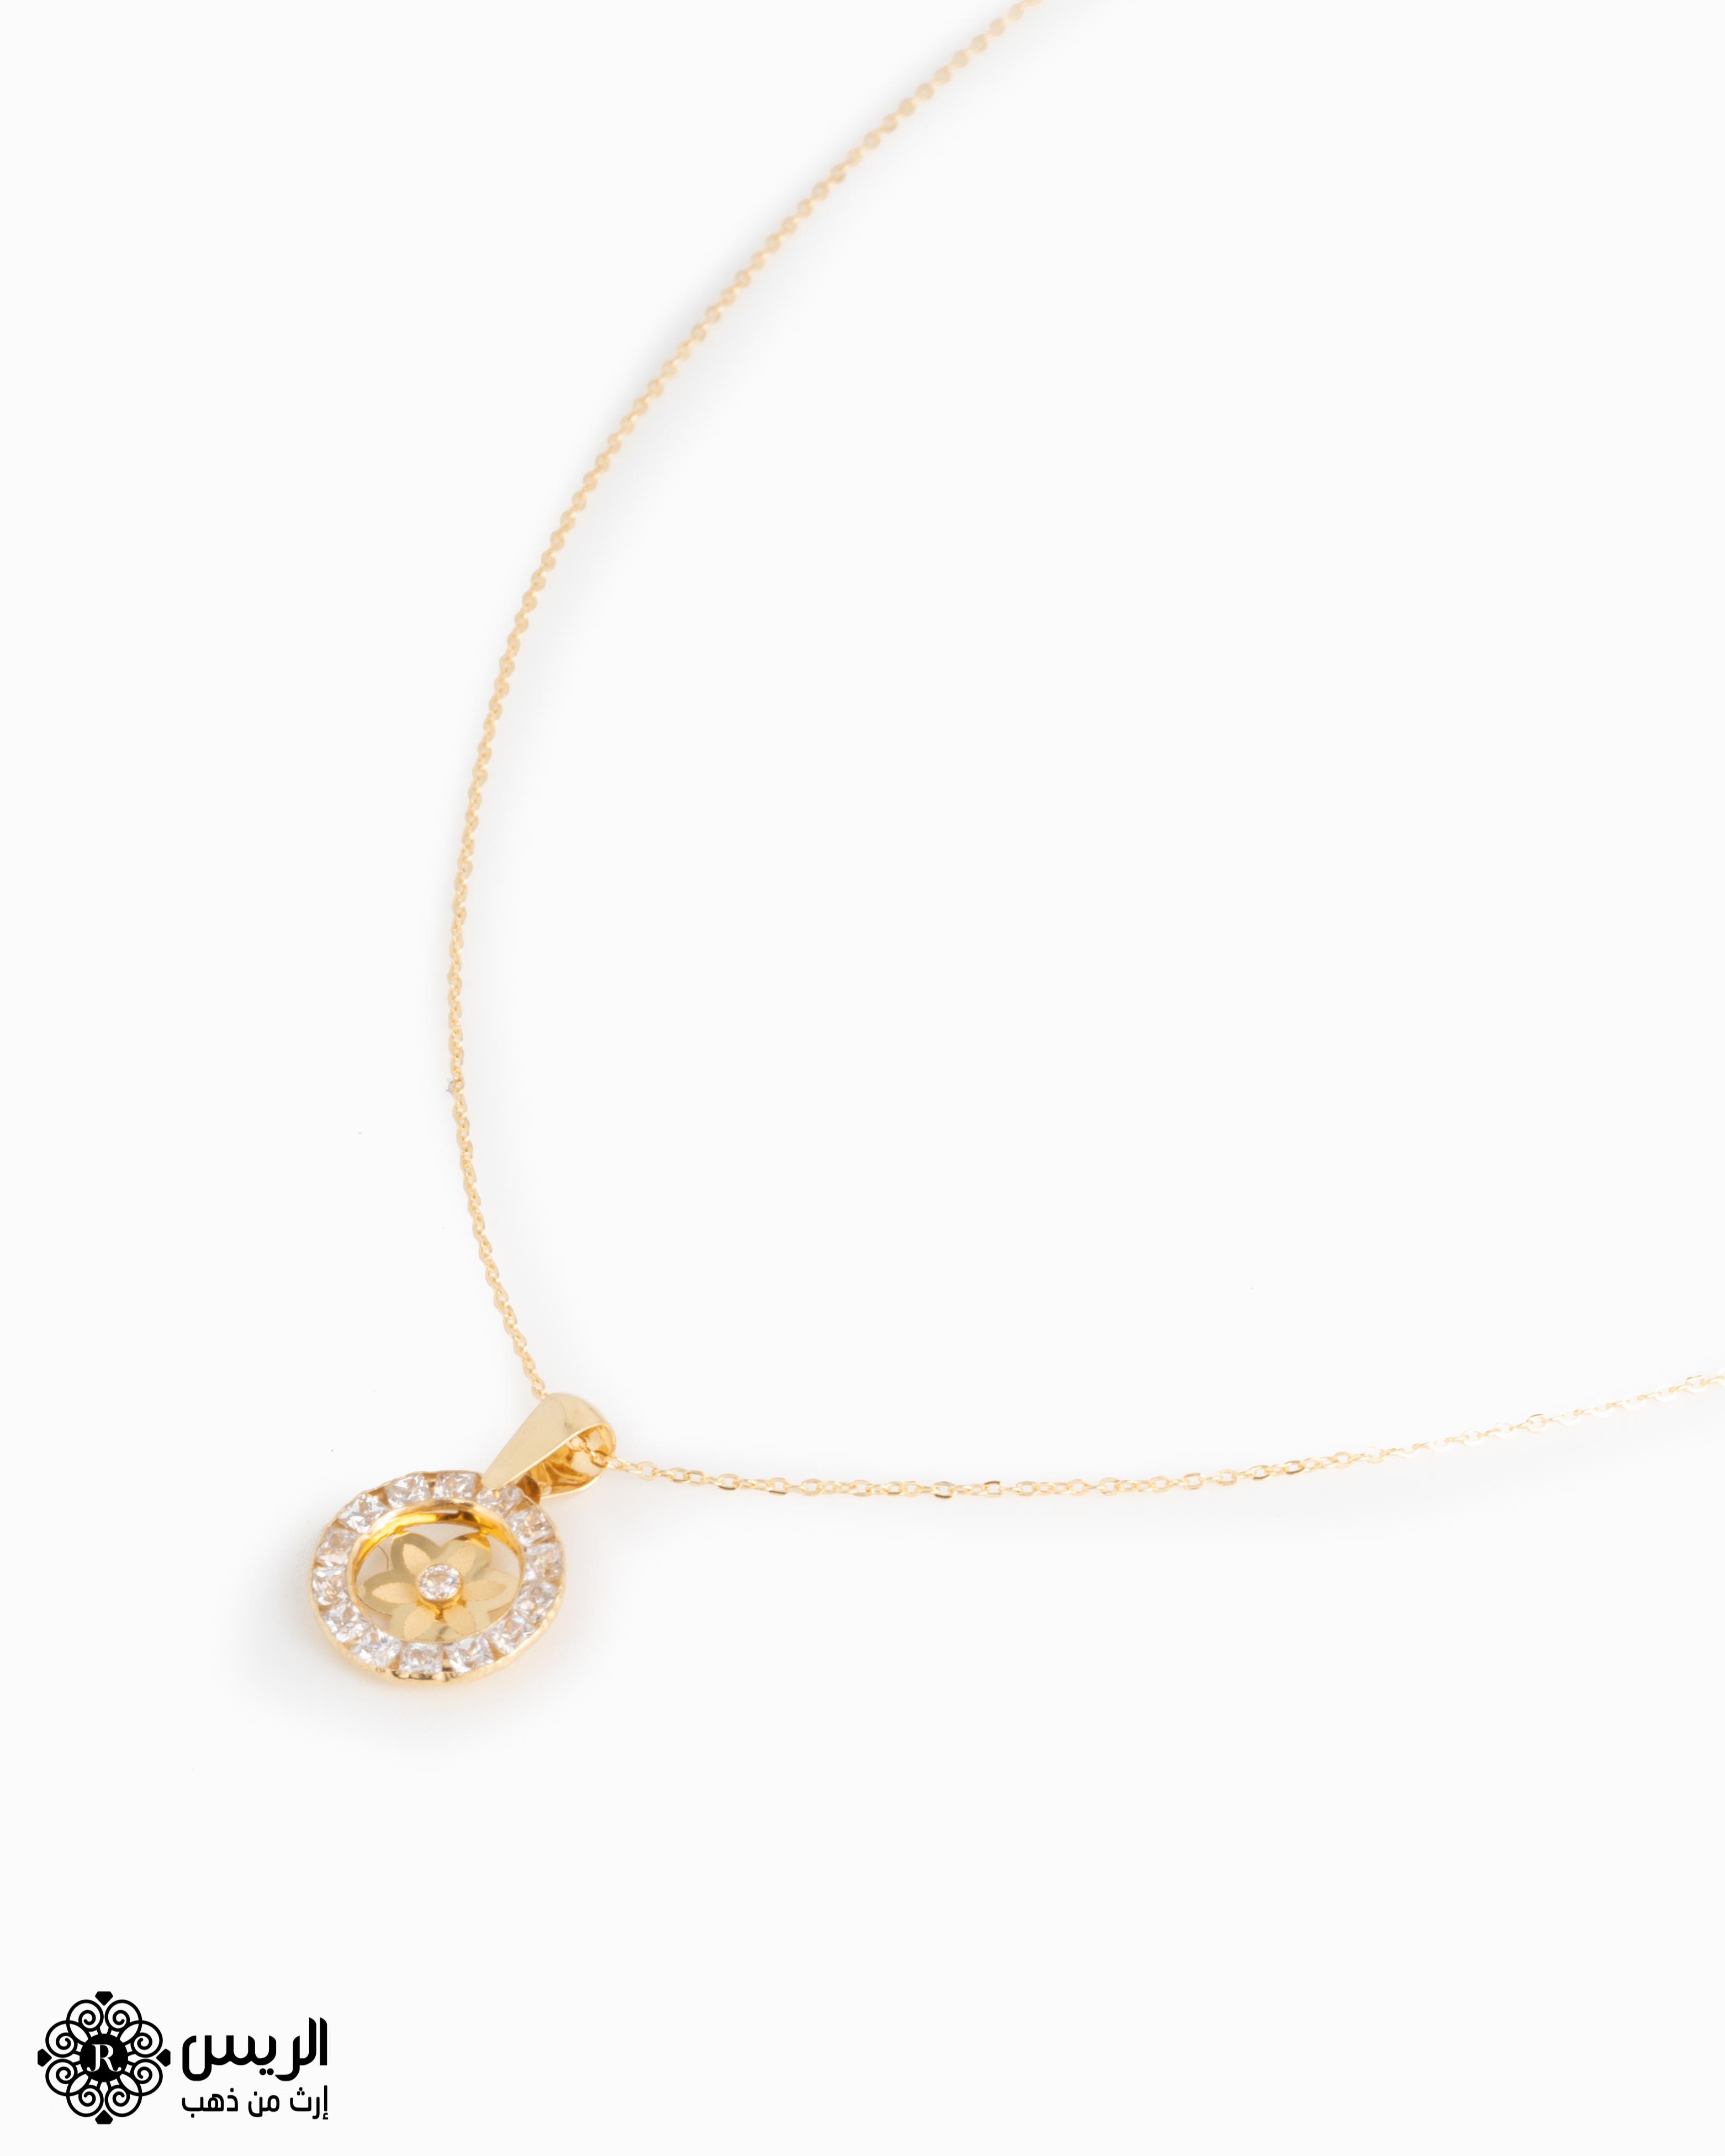 Raies jewelry Pendant with Elegant Chain تعليقة مع سلسله ناعمة الريس للمجوهرات